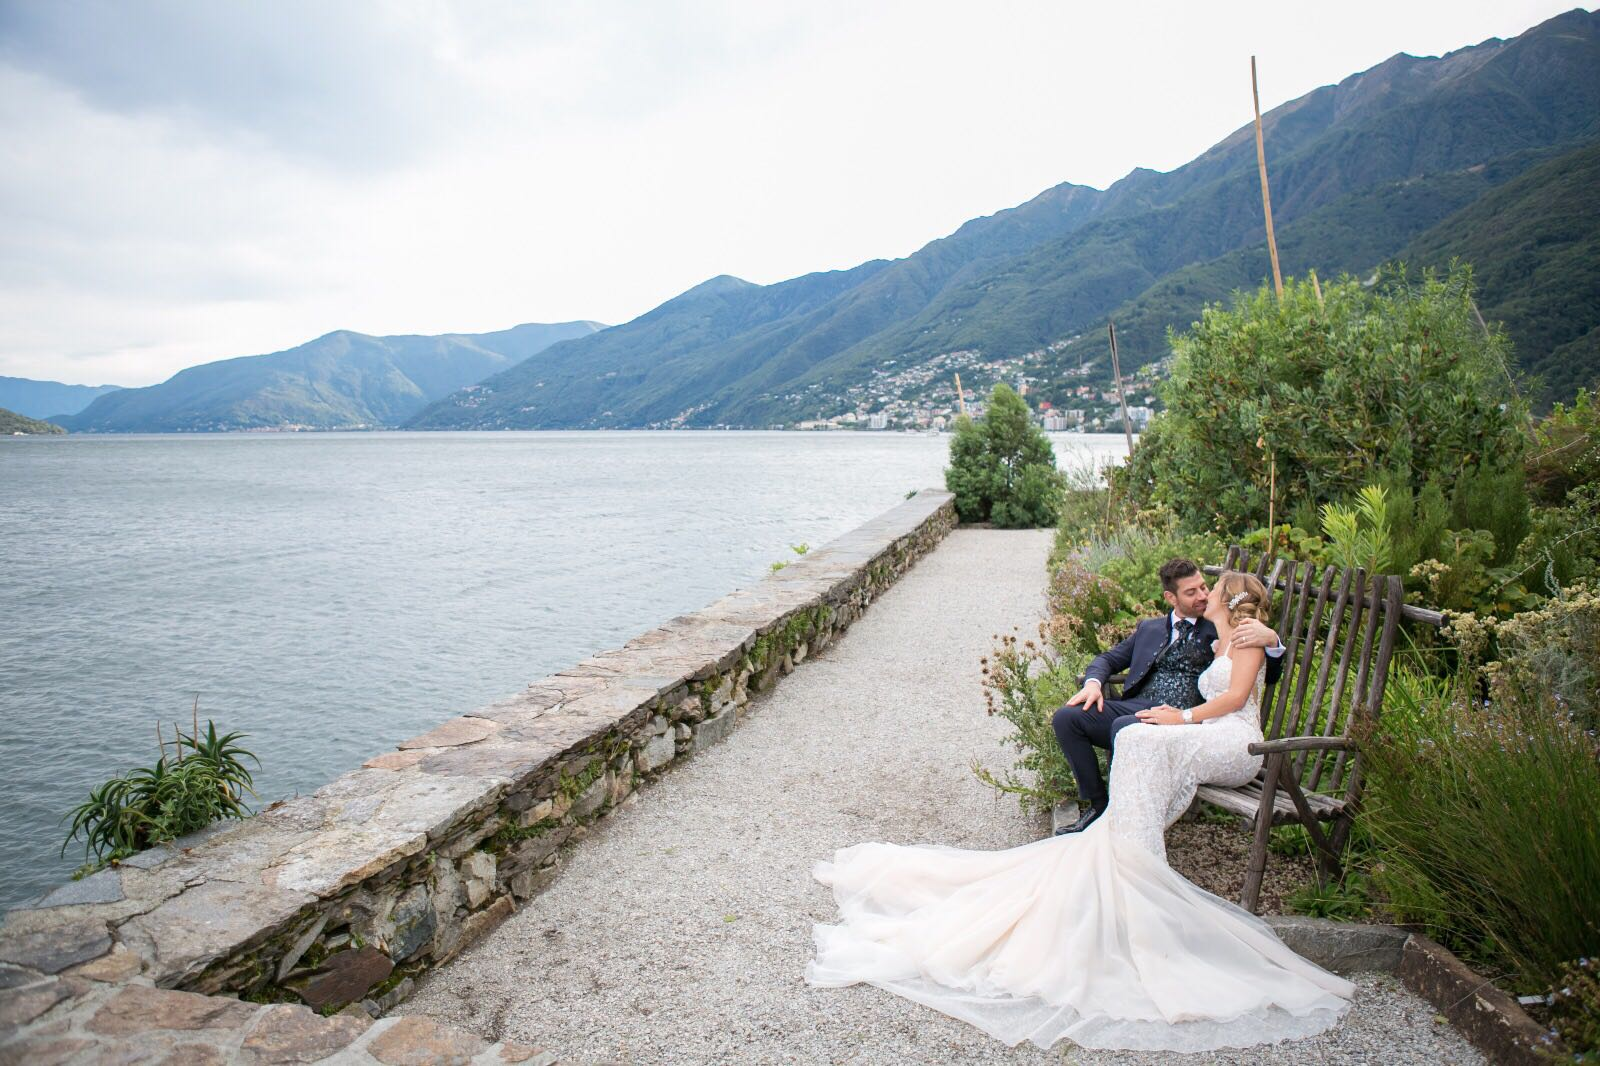 Matrimonio Lago Toscana : Matrimonio sul lago real wedding ivan jennin